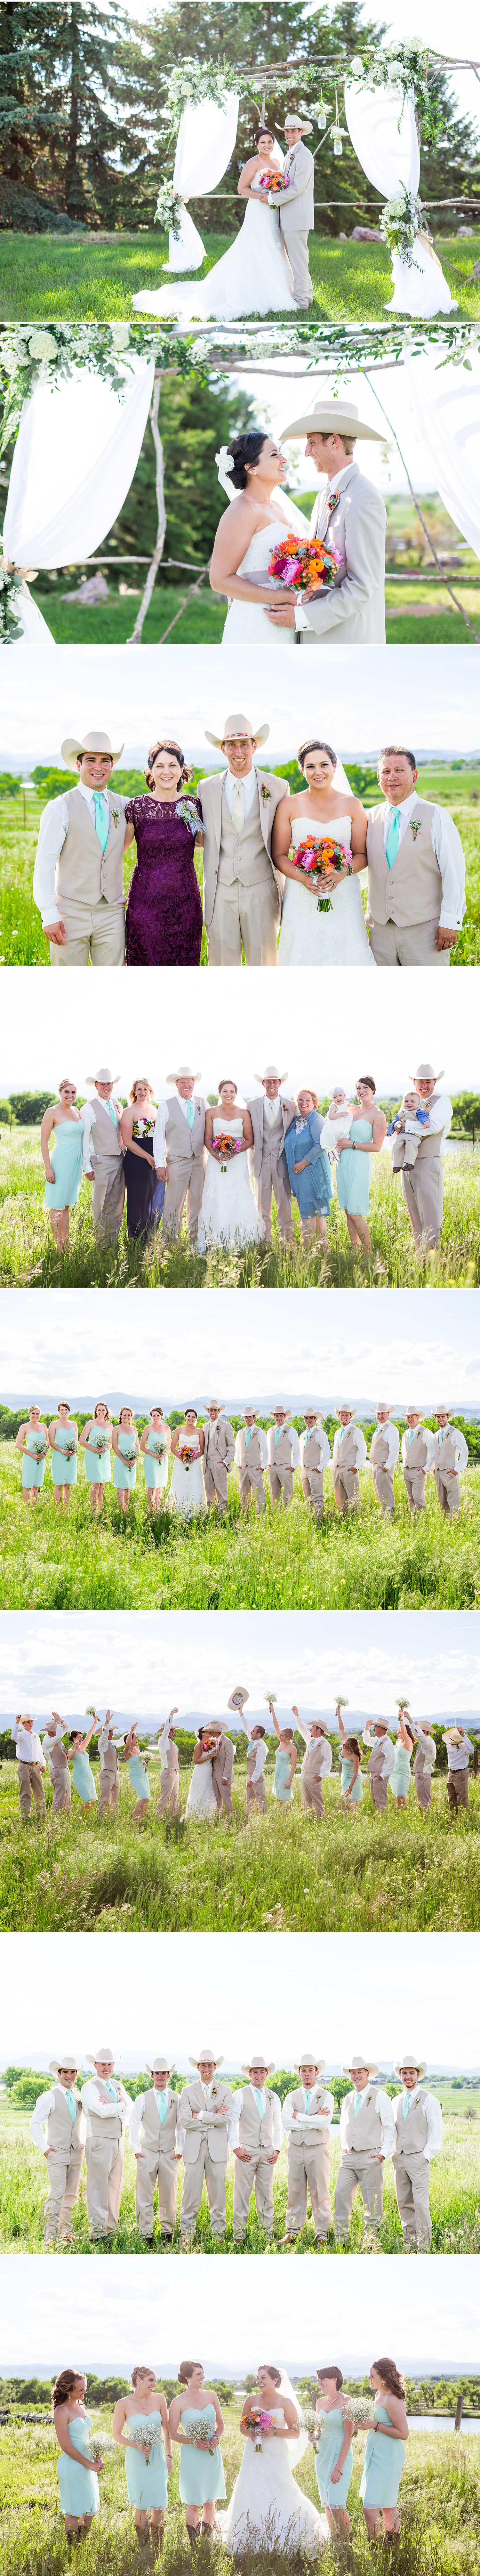 6_loveland wedding phototgraphy.jpg